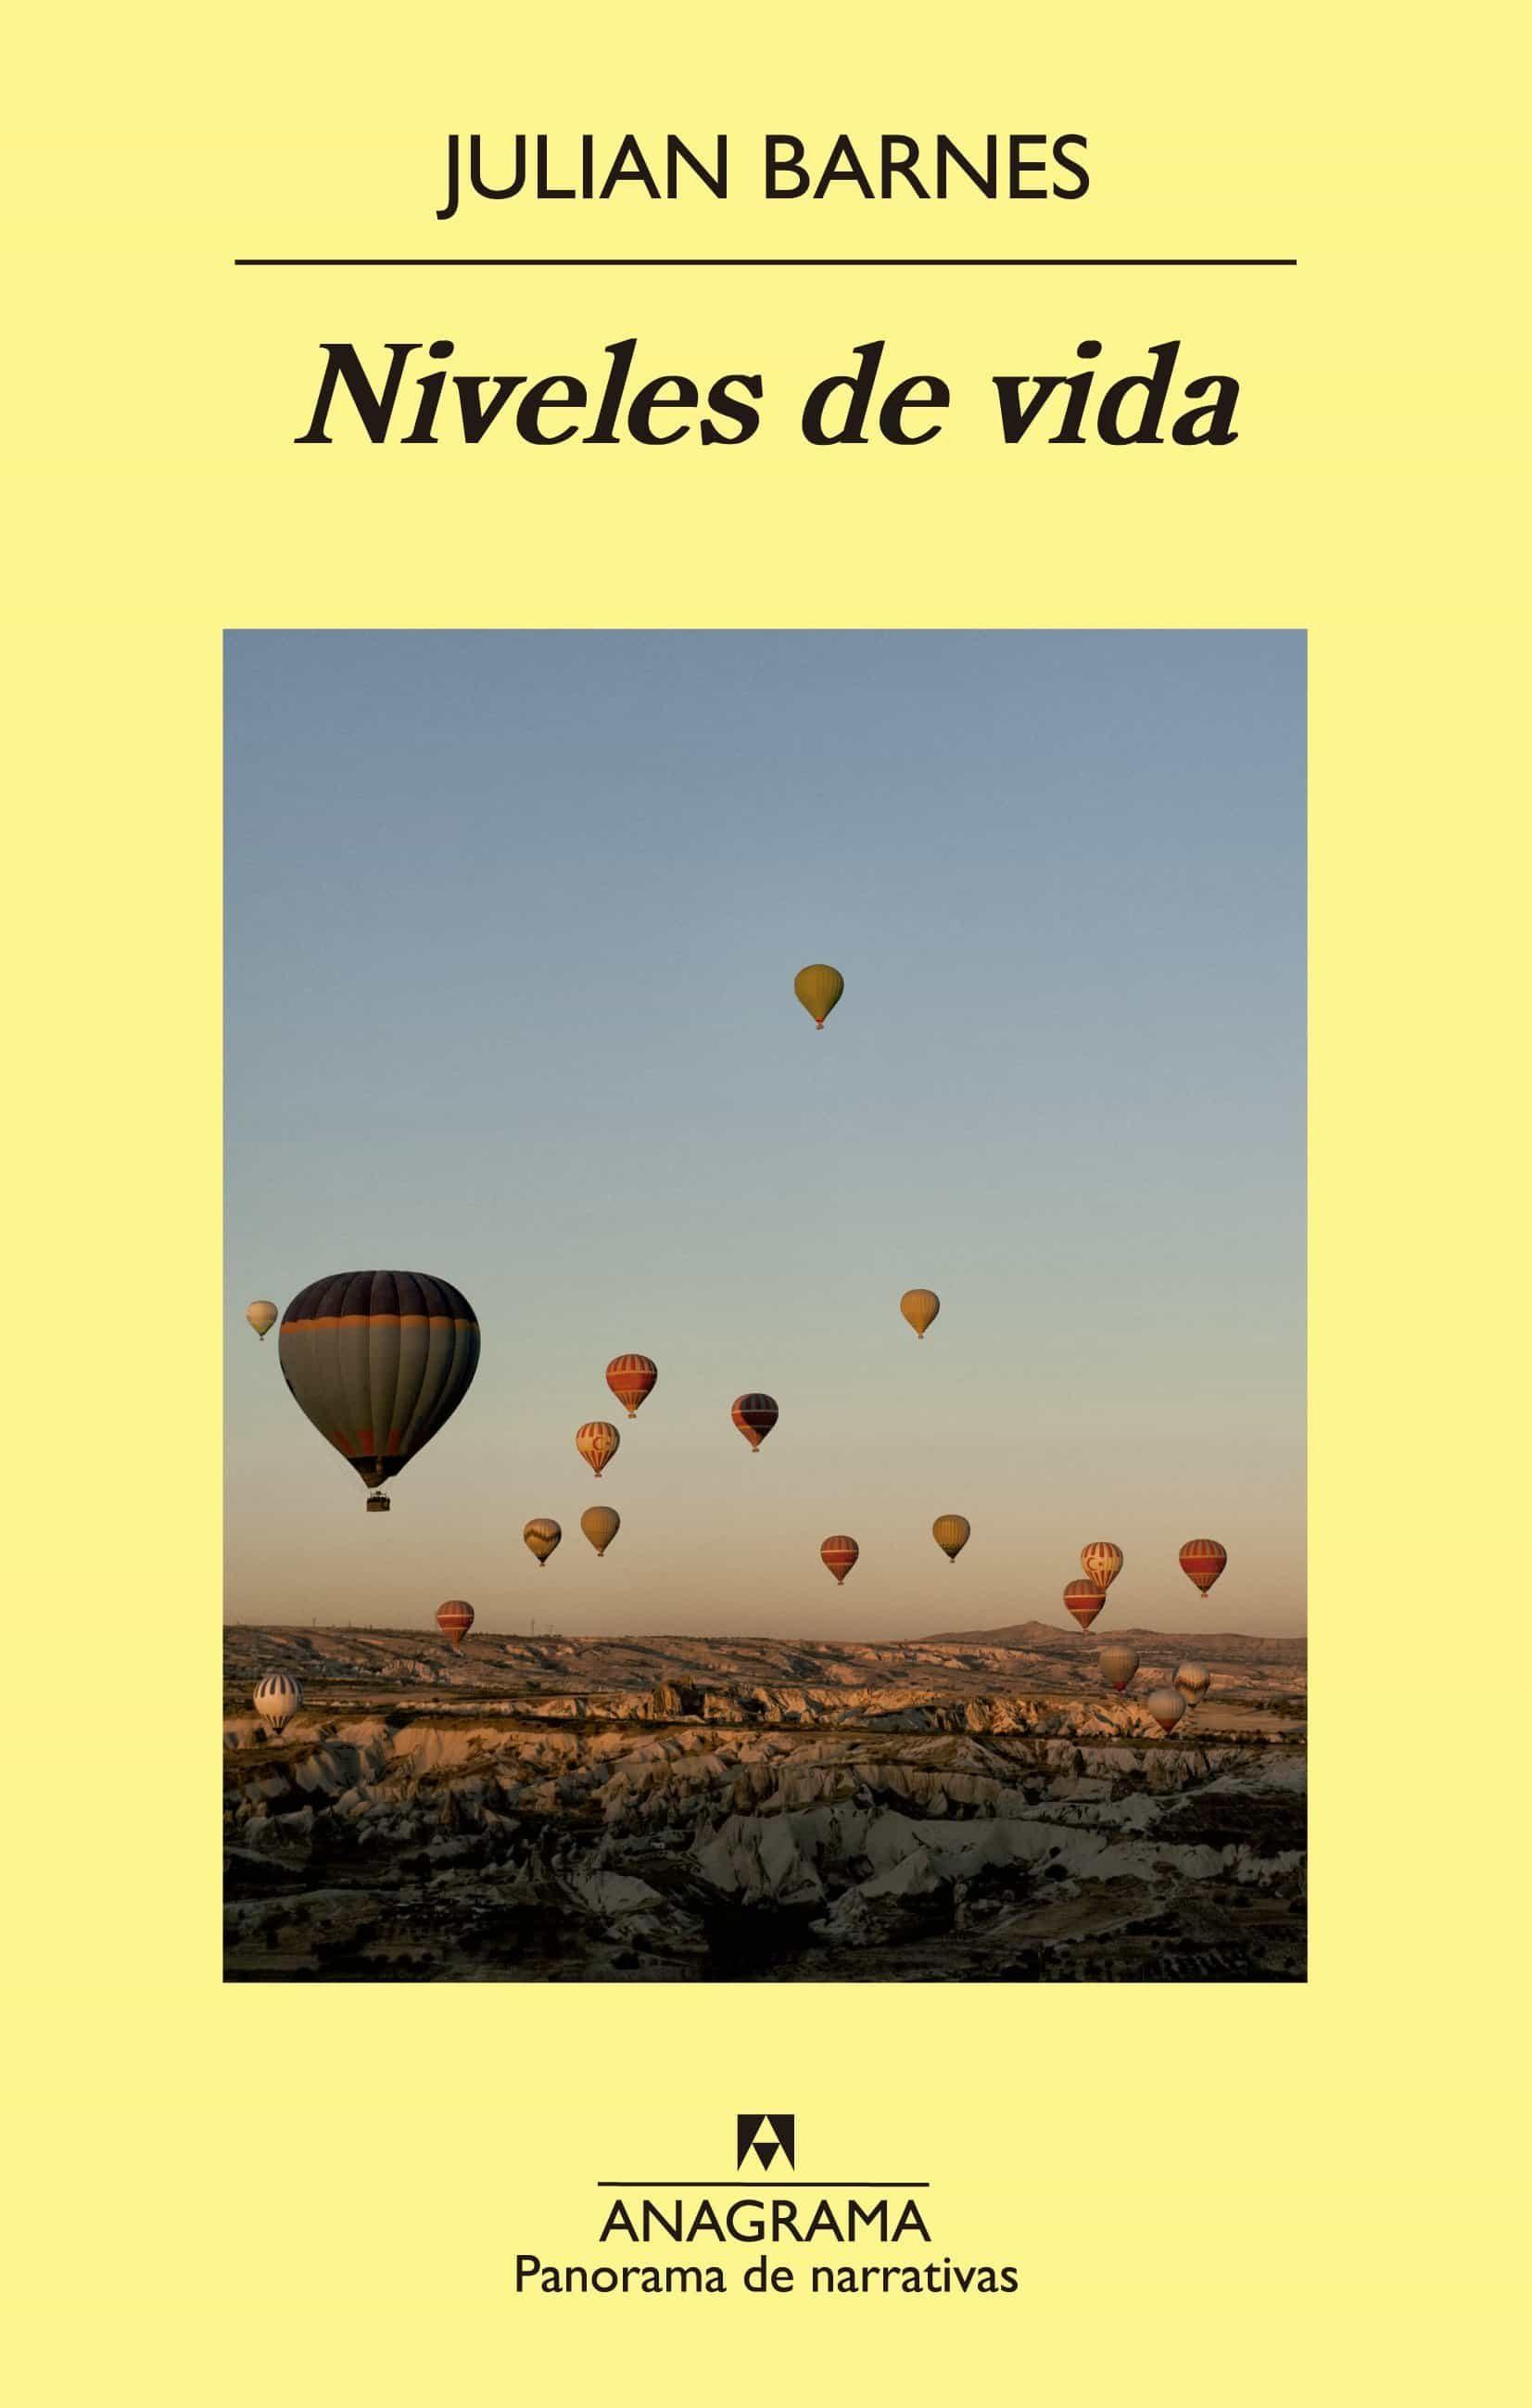 JULIAN BARNES LIBROS PDF